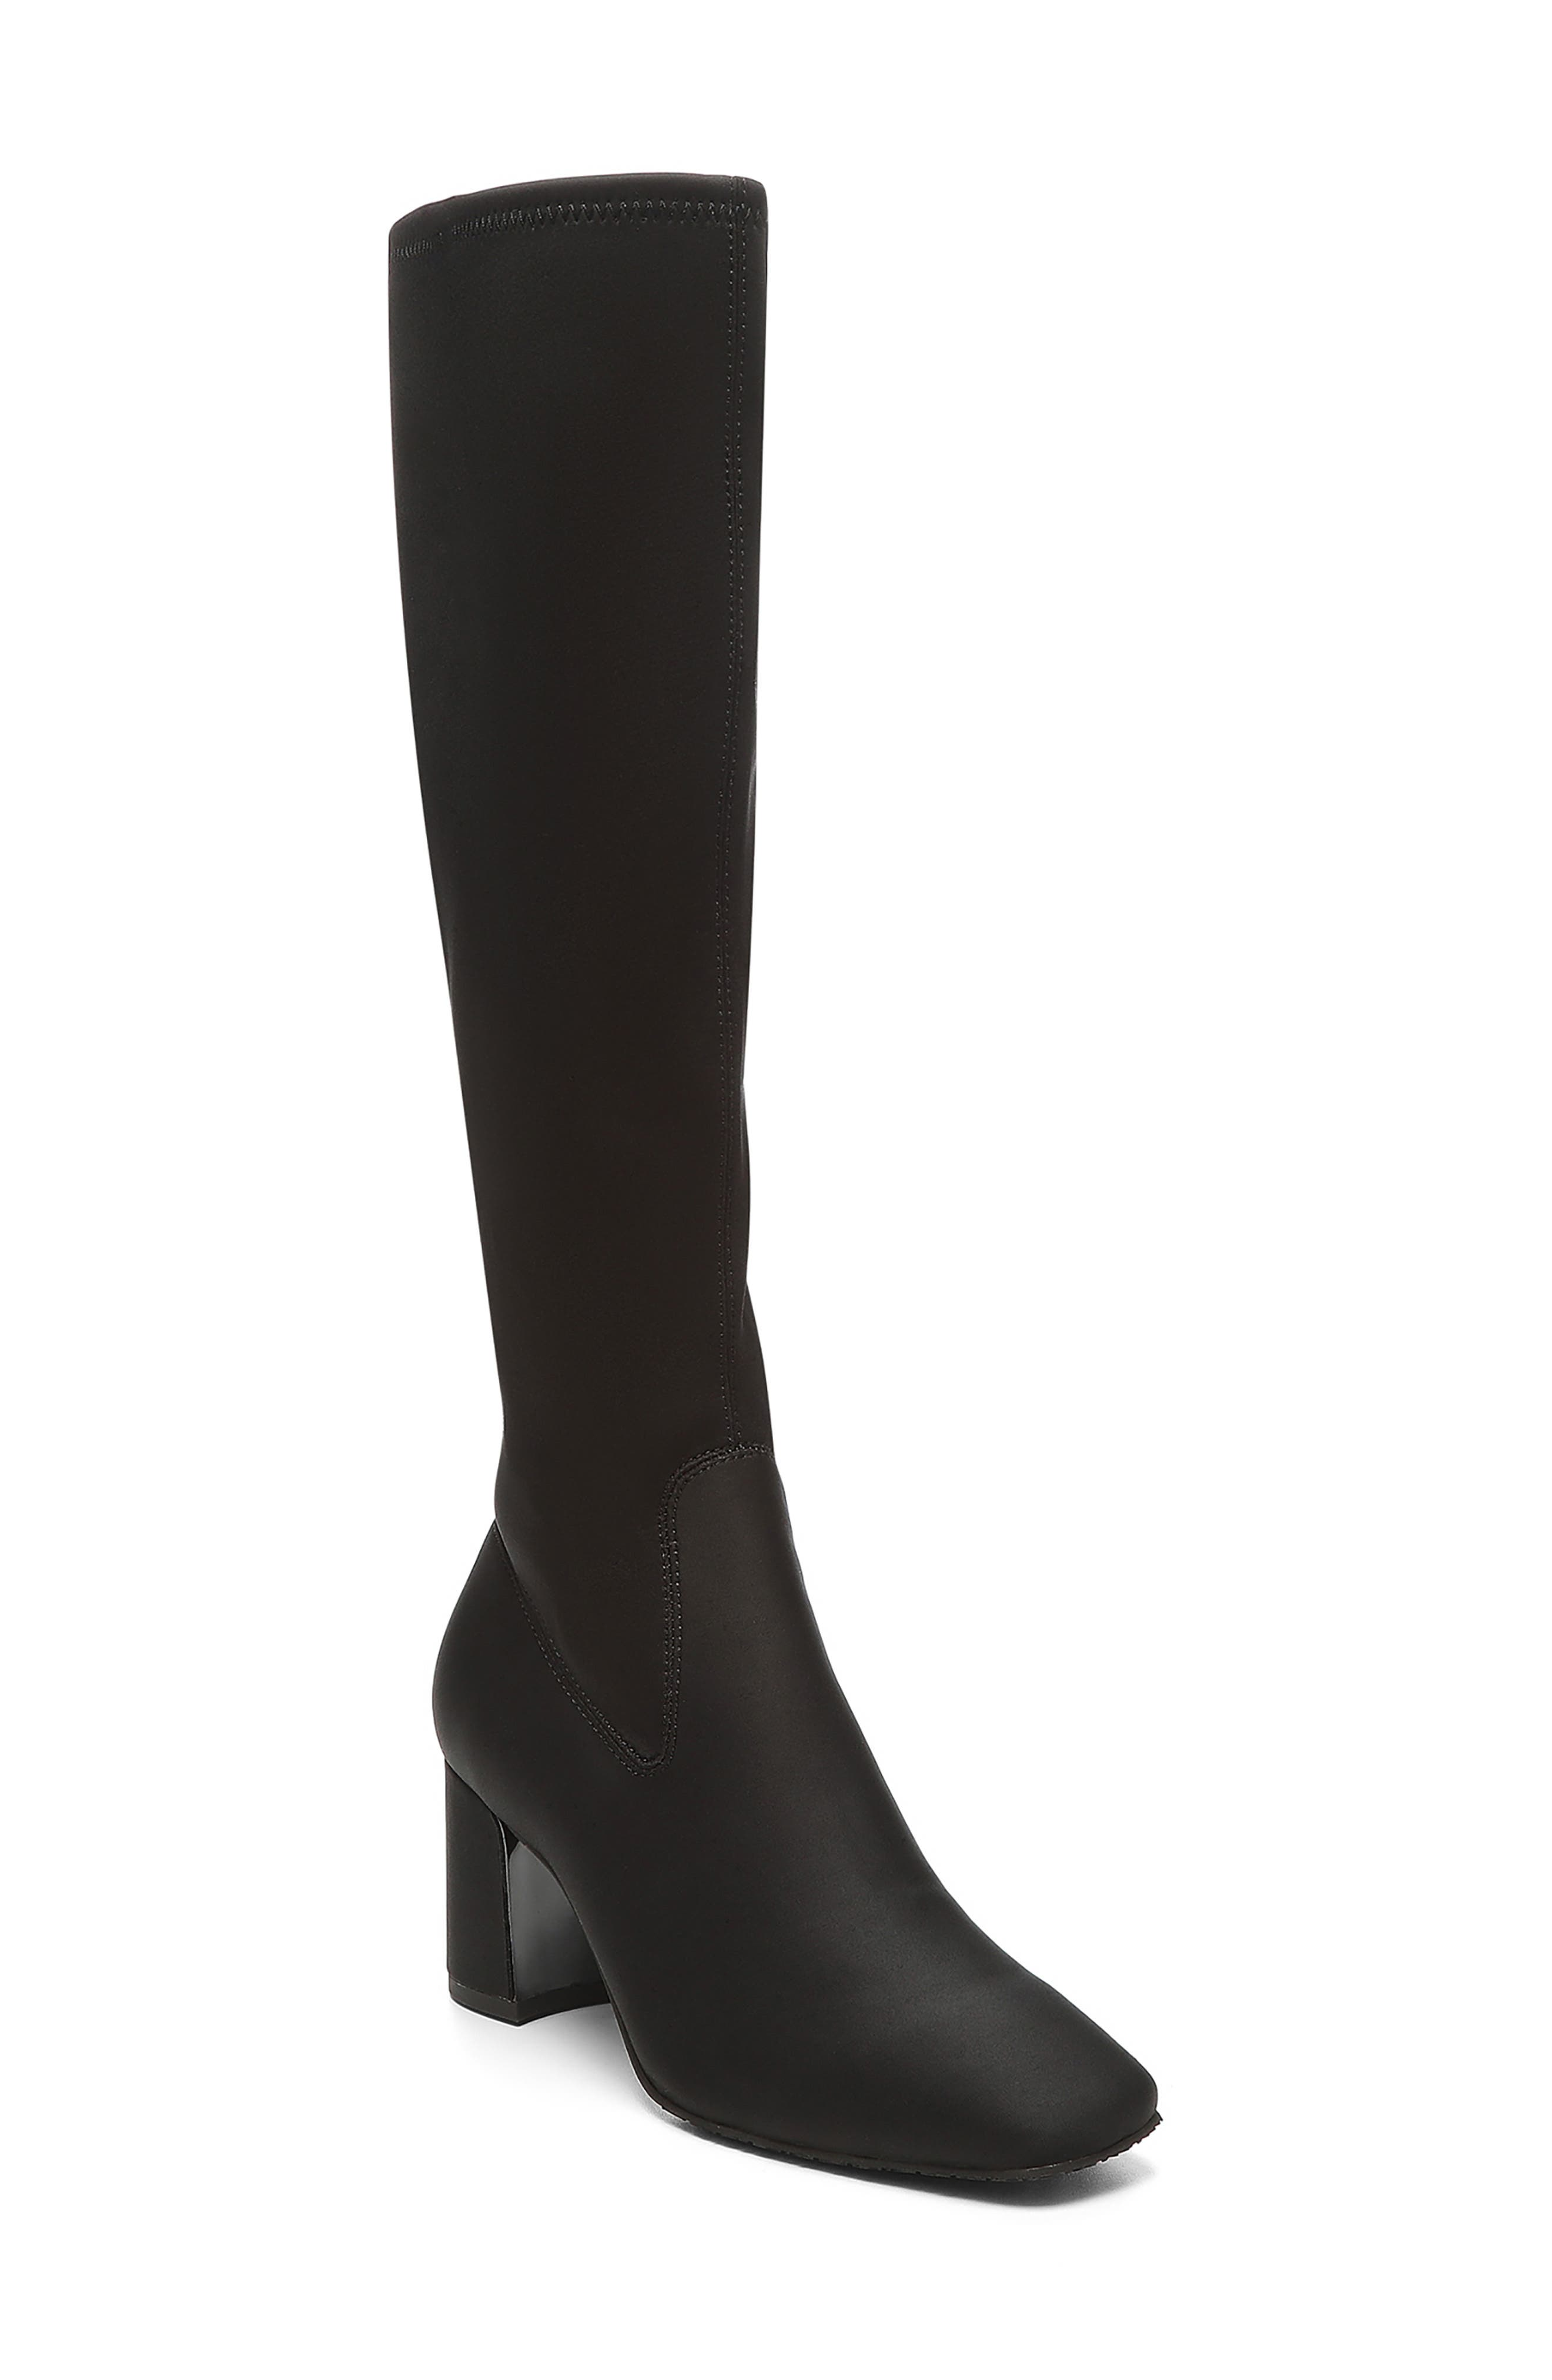 Cassidy Knee High Boot